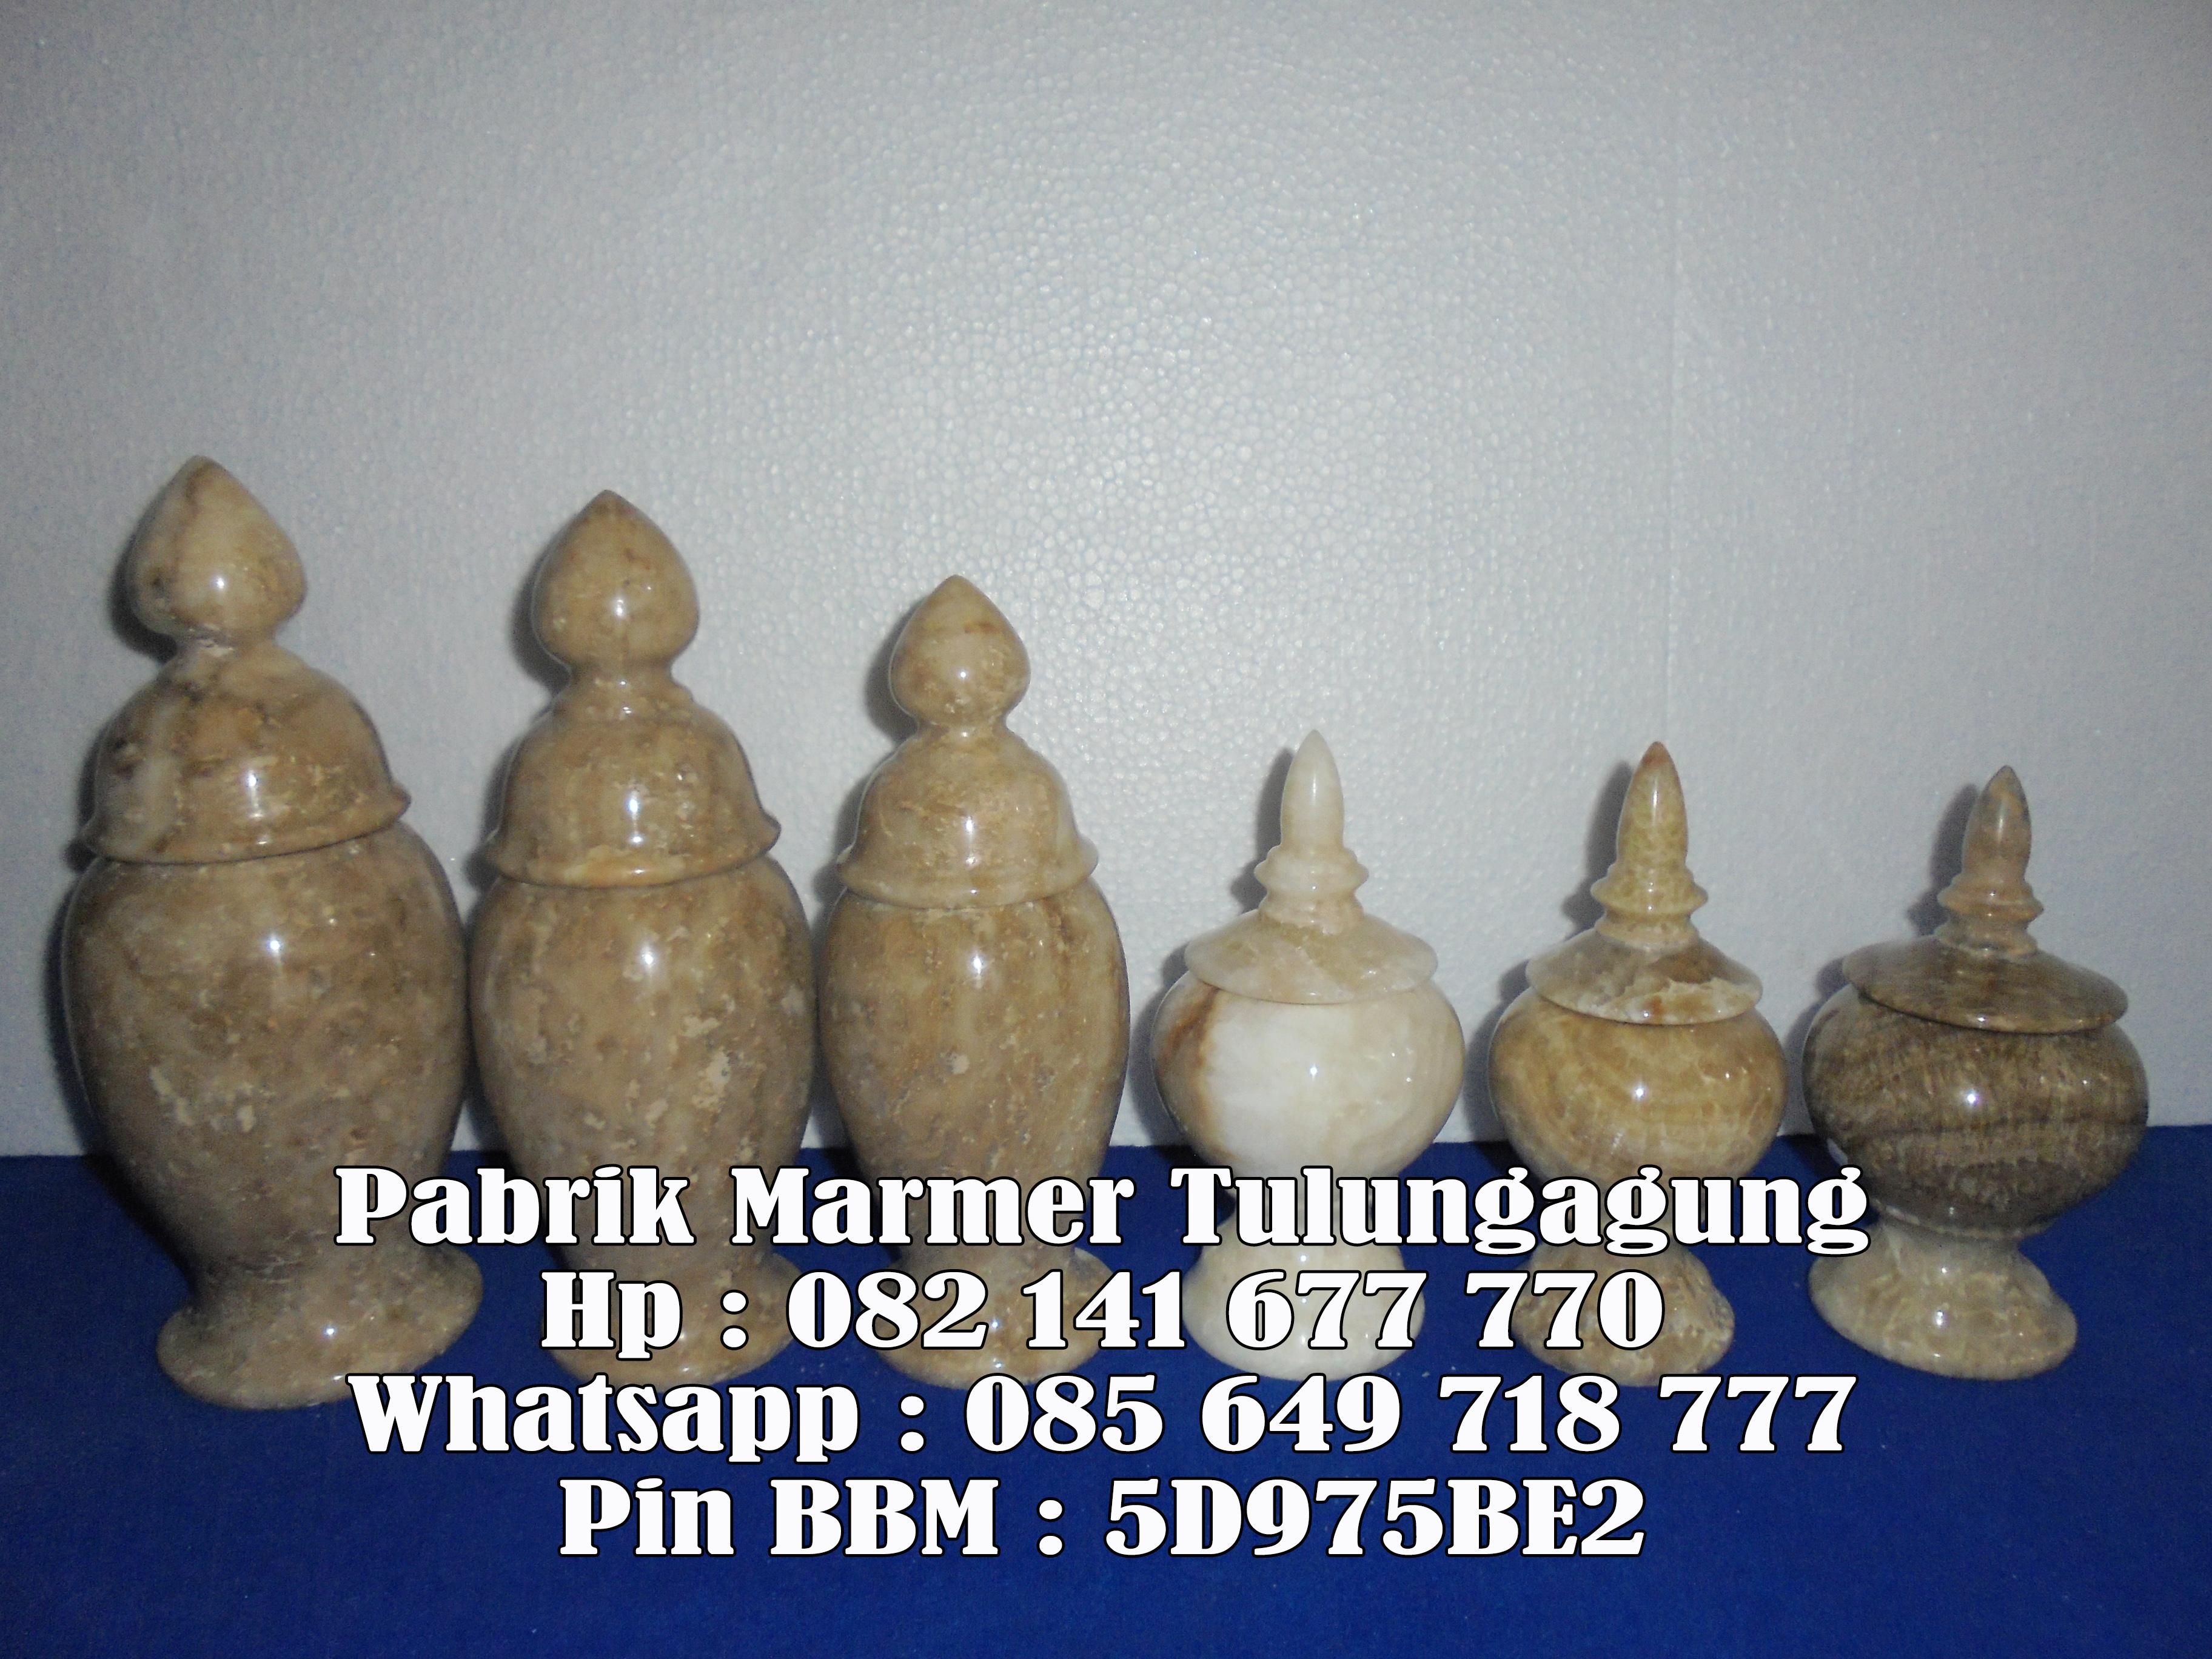 Kerajinan Marmer Tulungagung | Souvenir Marmer Tulungagung